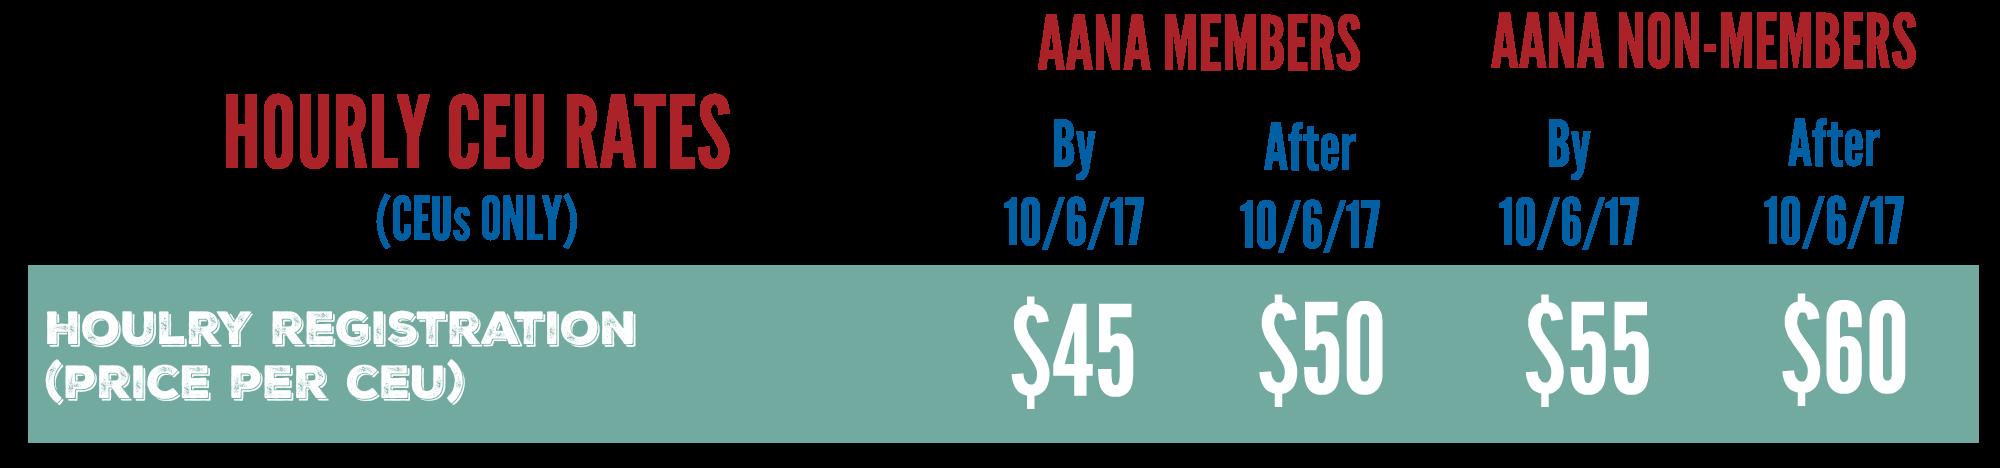 FANA Hourly Annual Rates